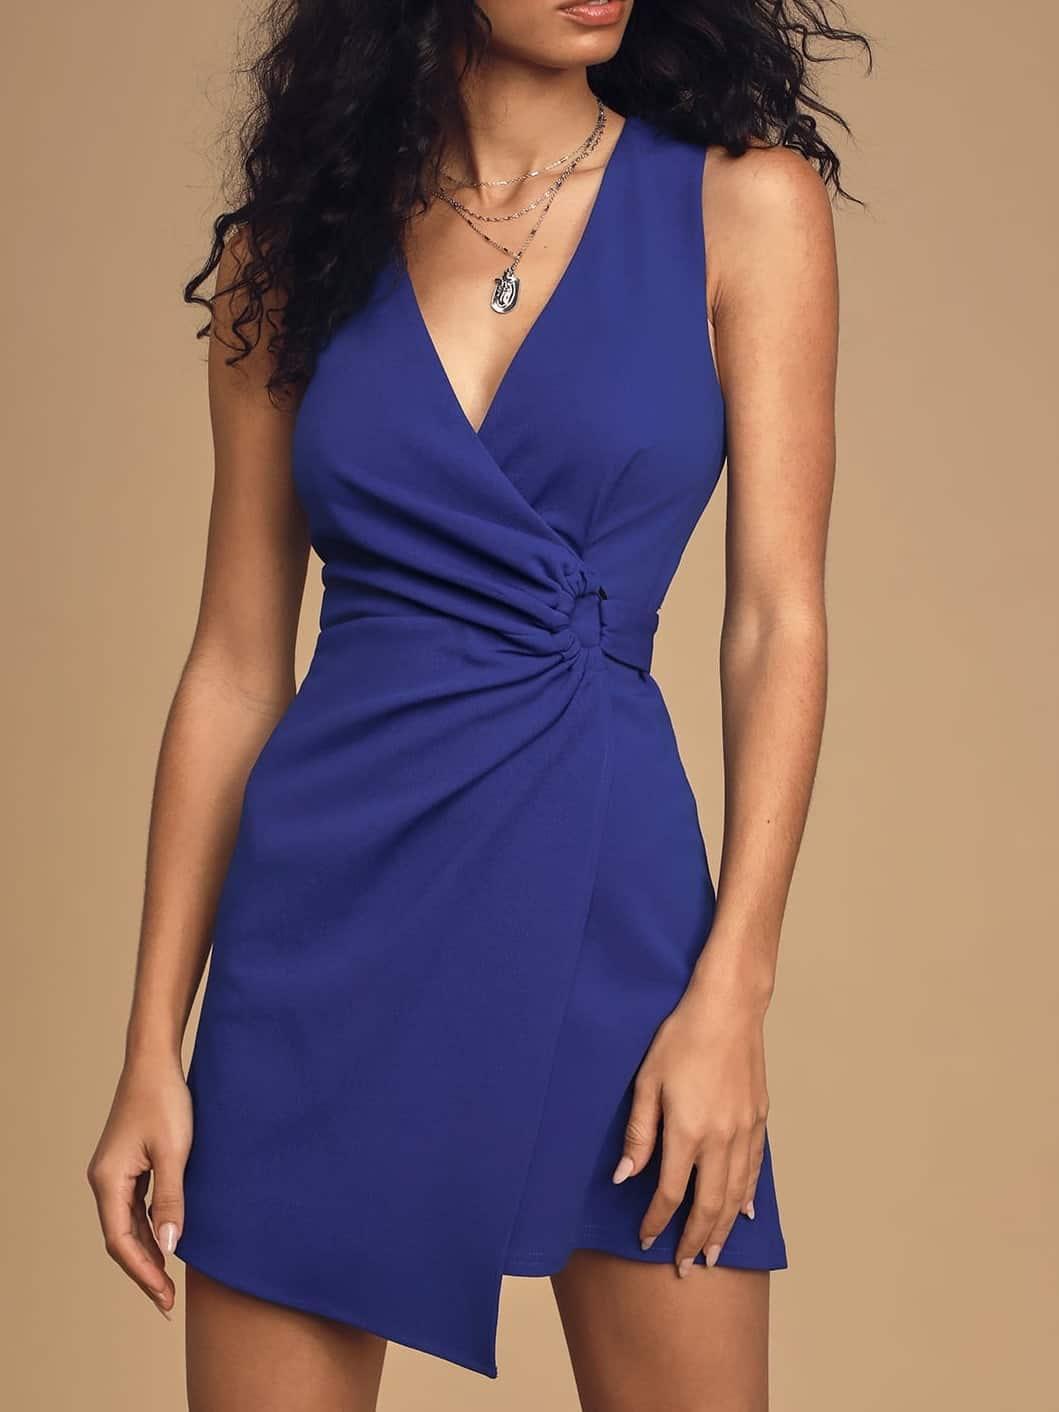 pref night dress